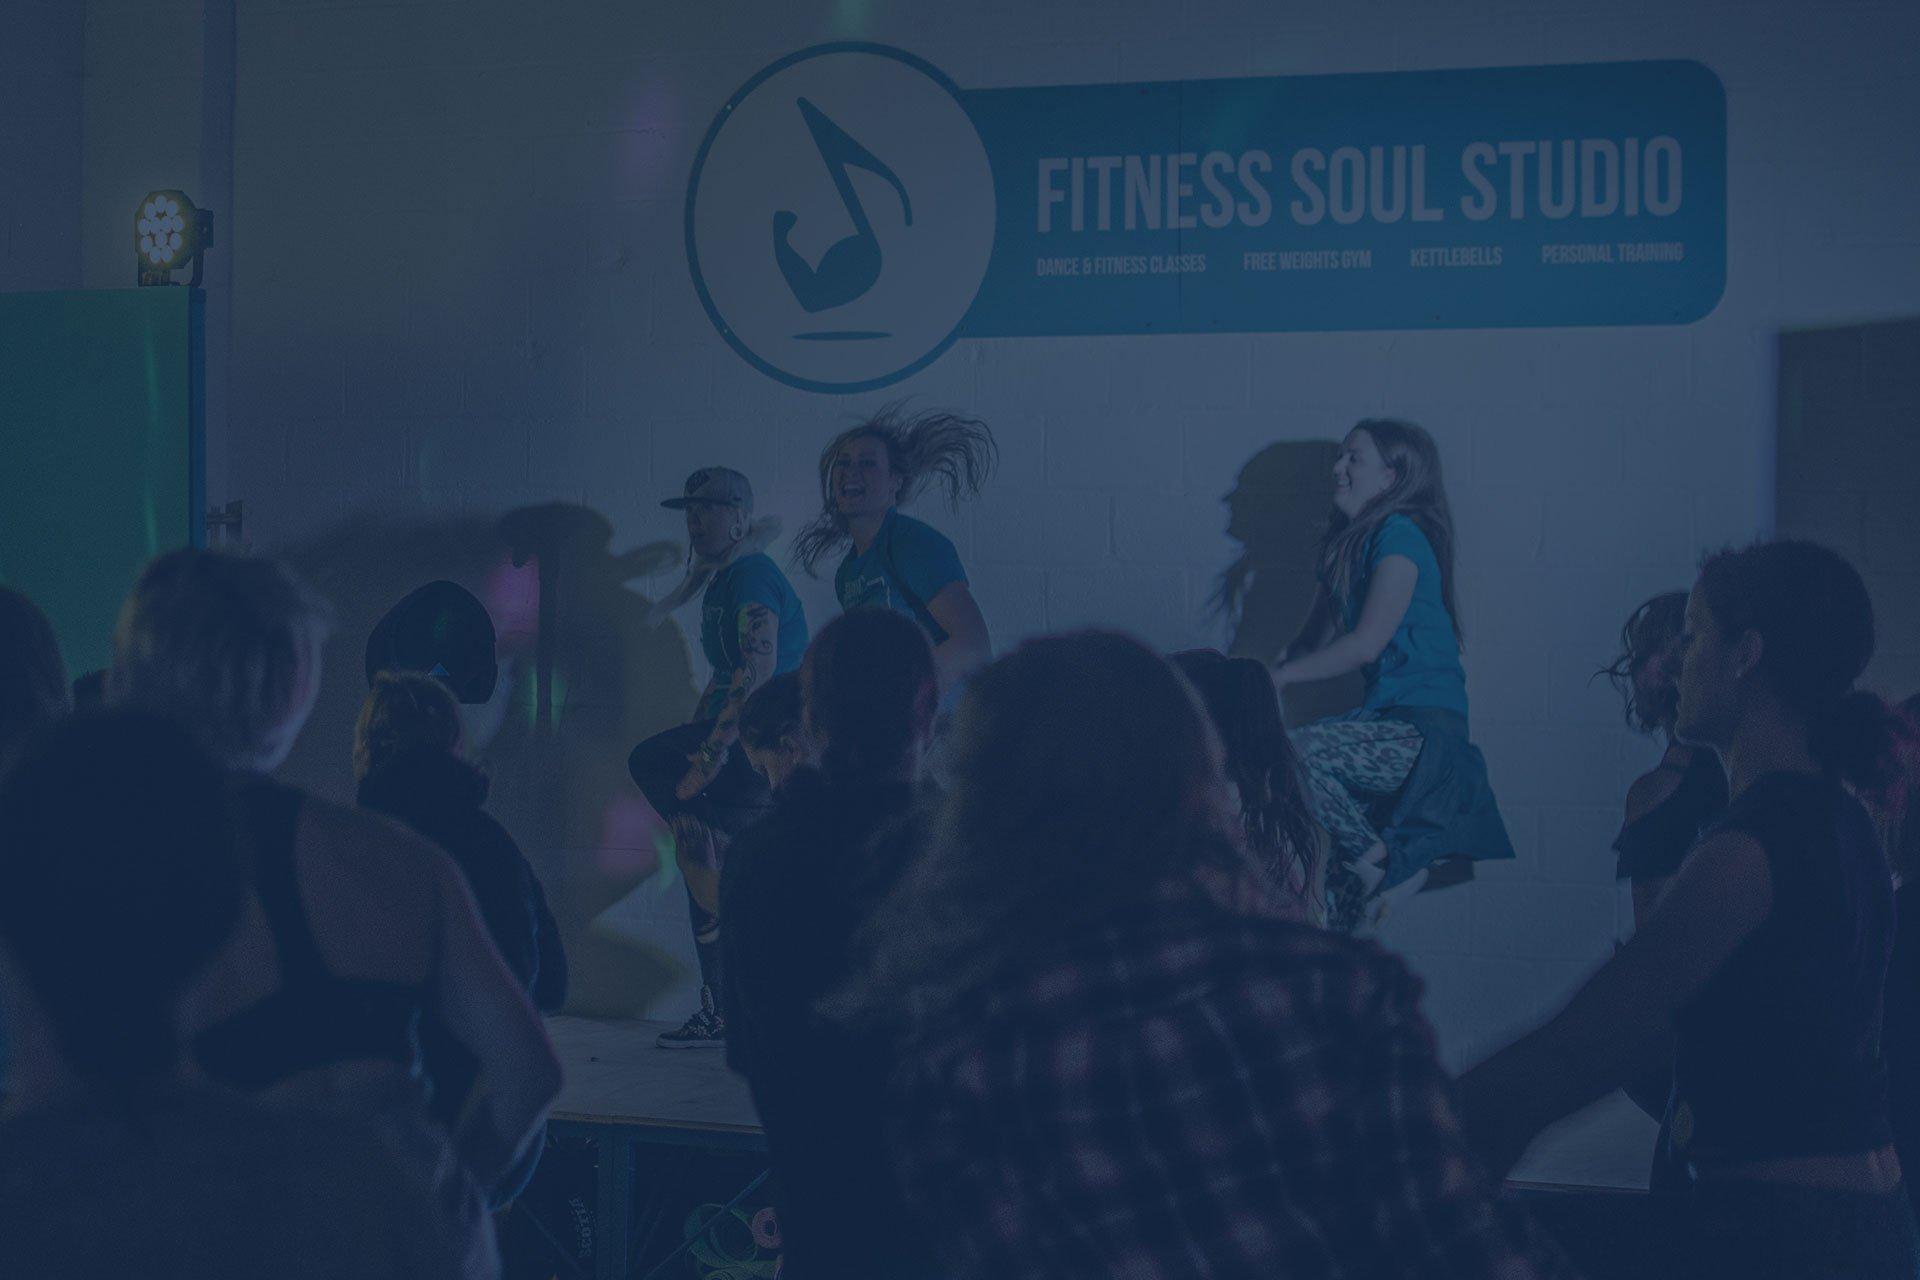 Fitness Soul Studio